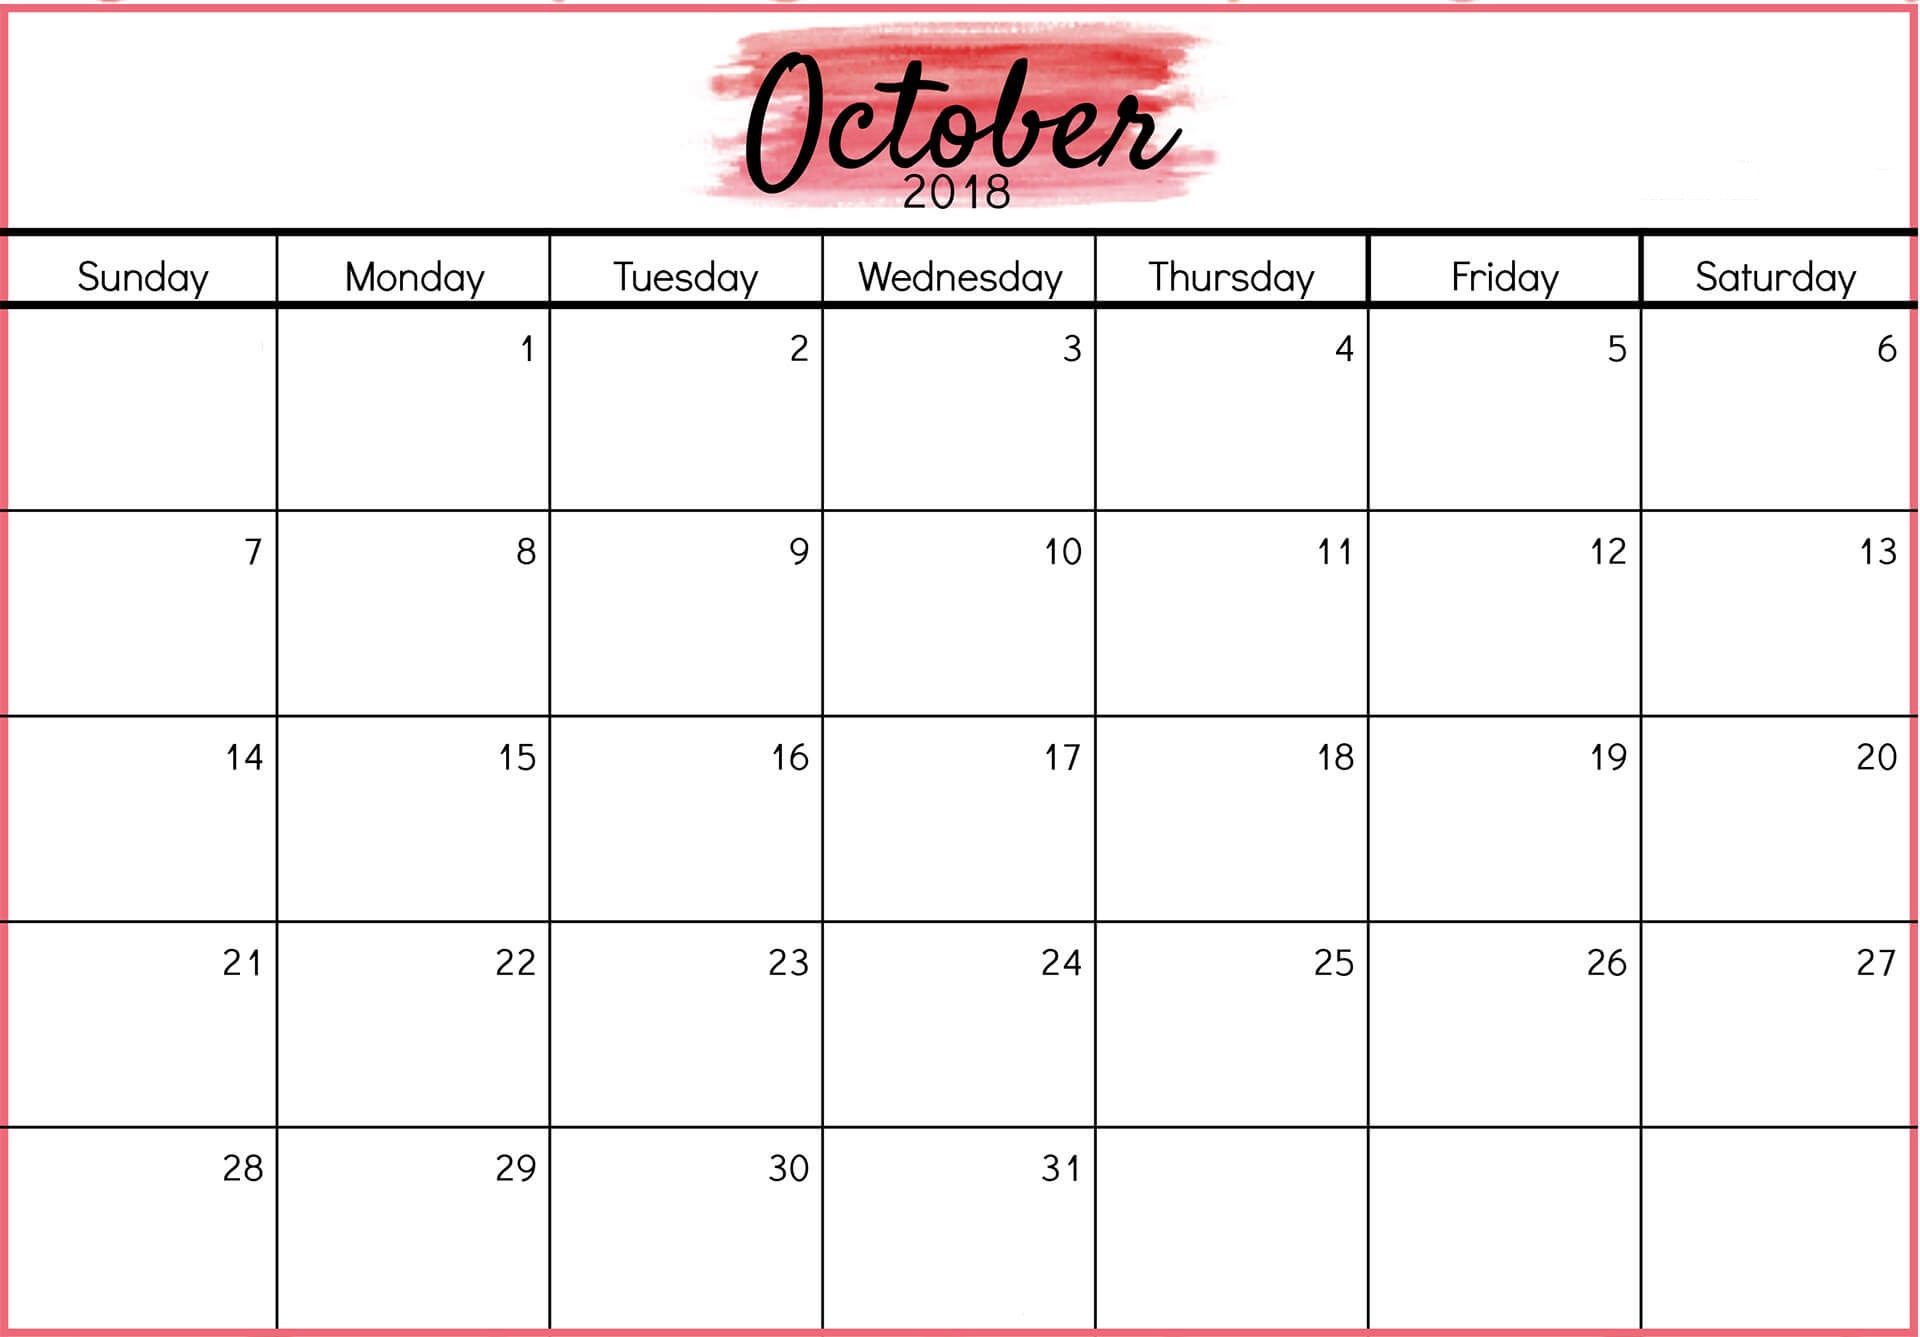 October Calendar 2018 in PDF